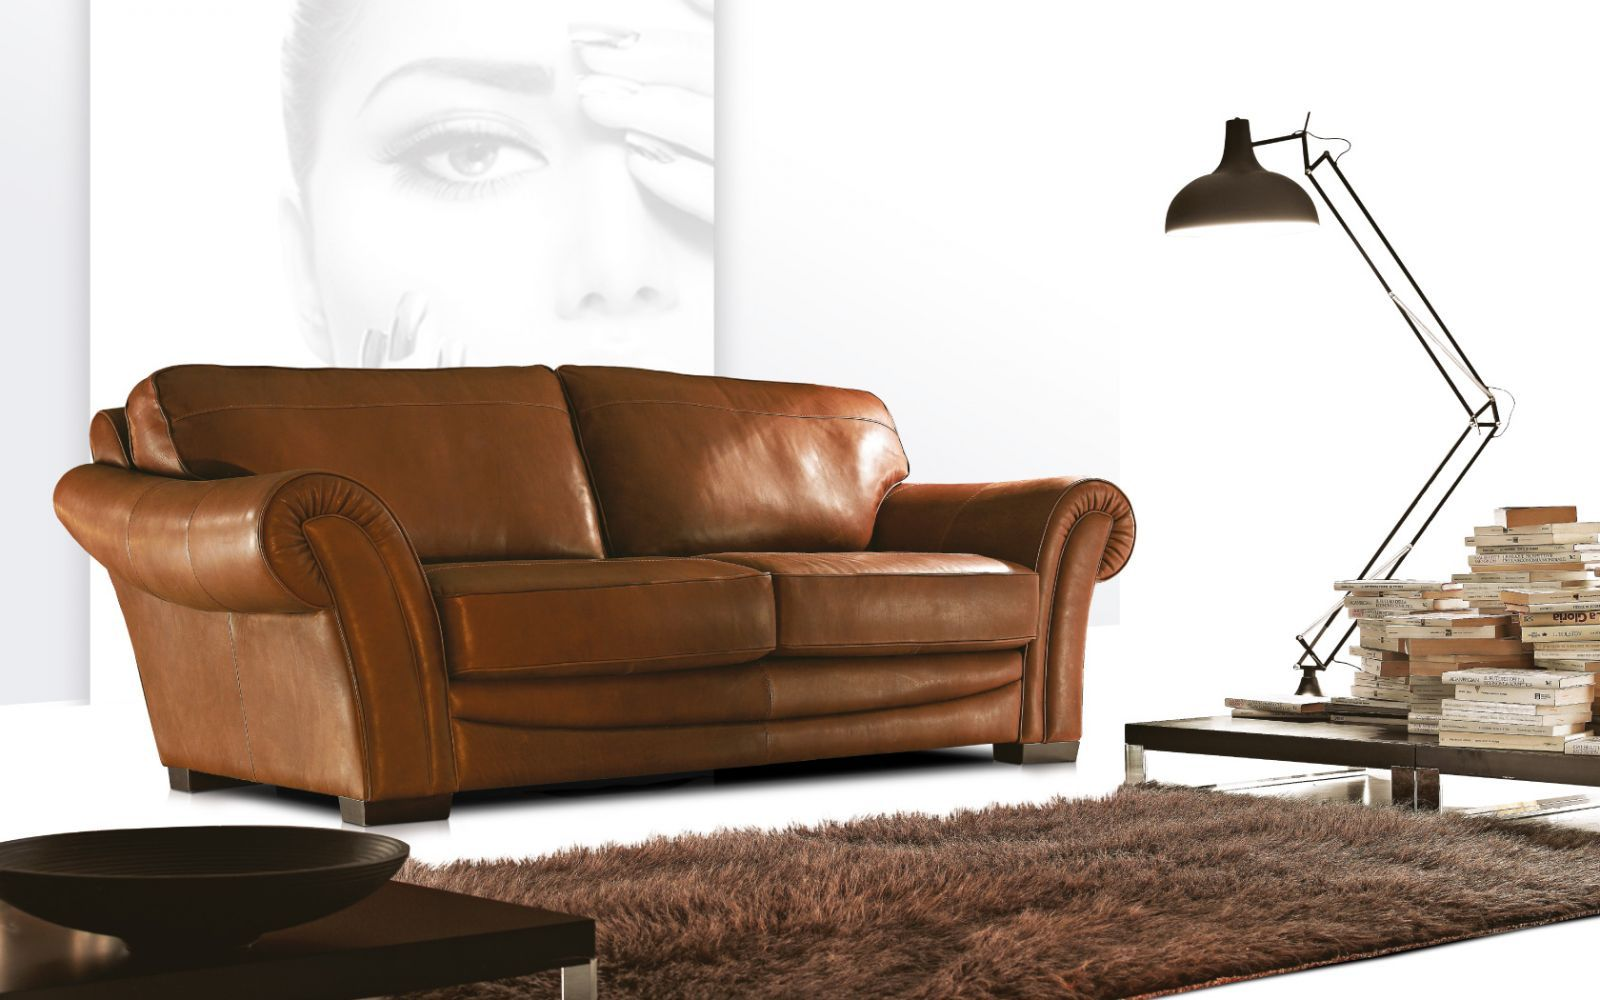 Divani Nicoline #salerno #design #casa #arredamento | Divani | Pinterest